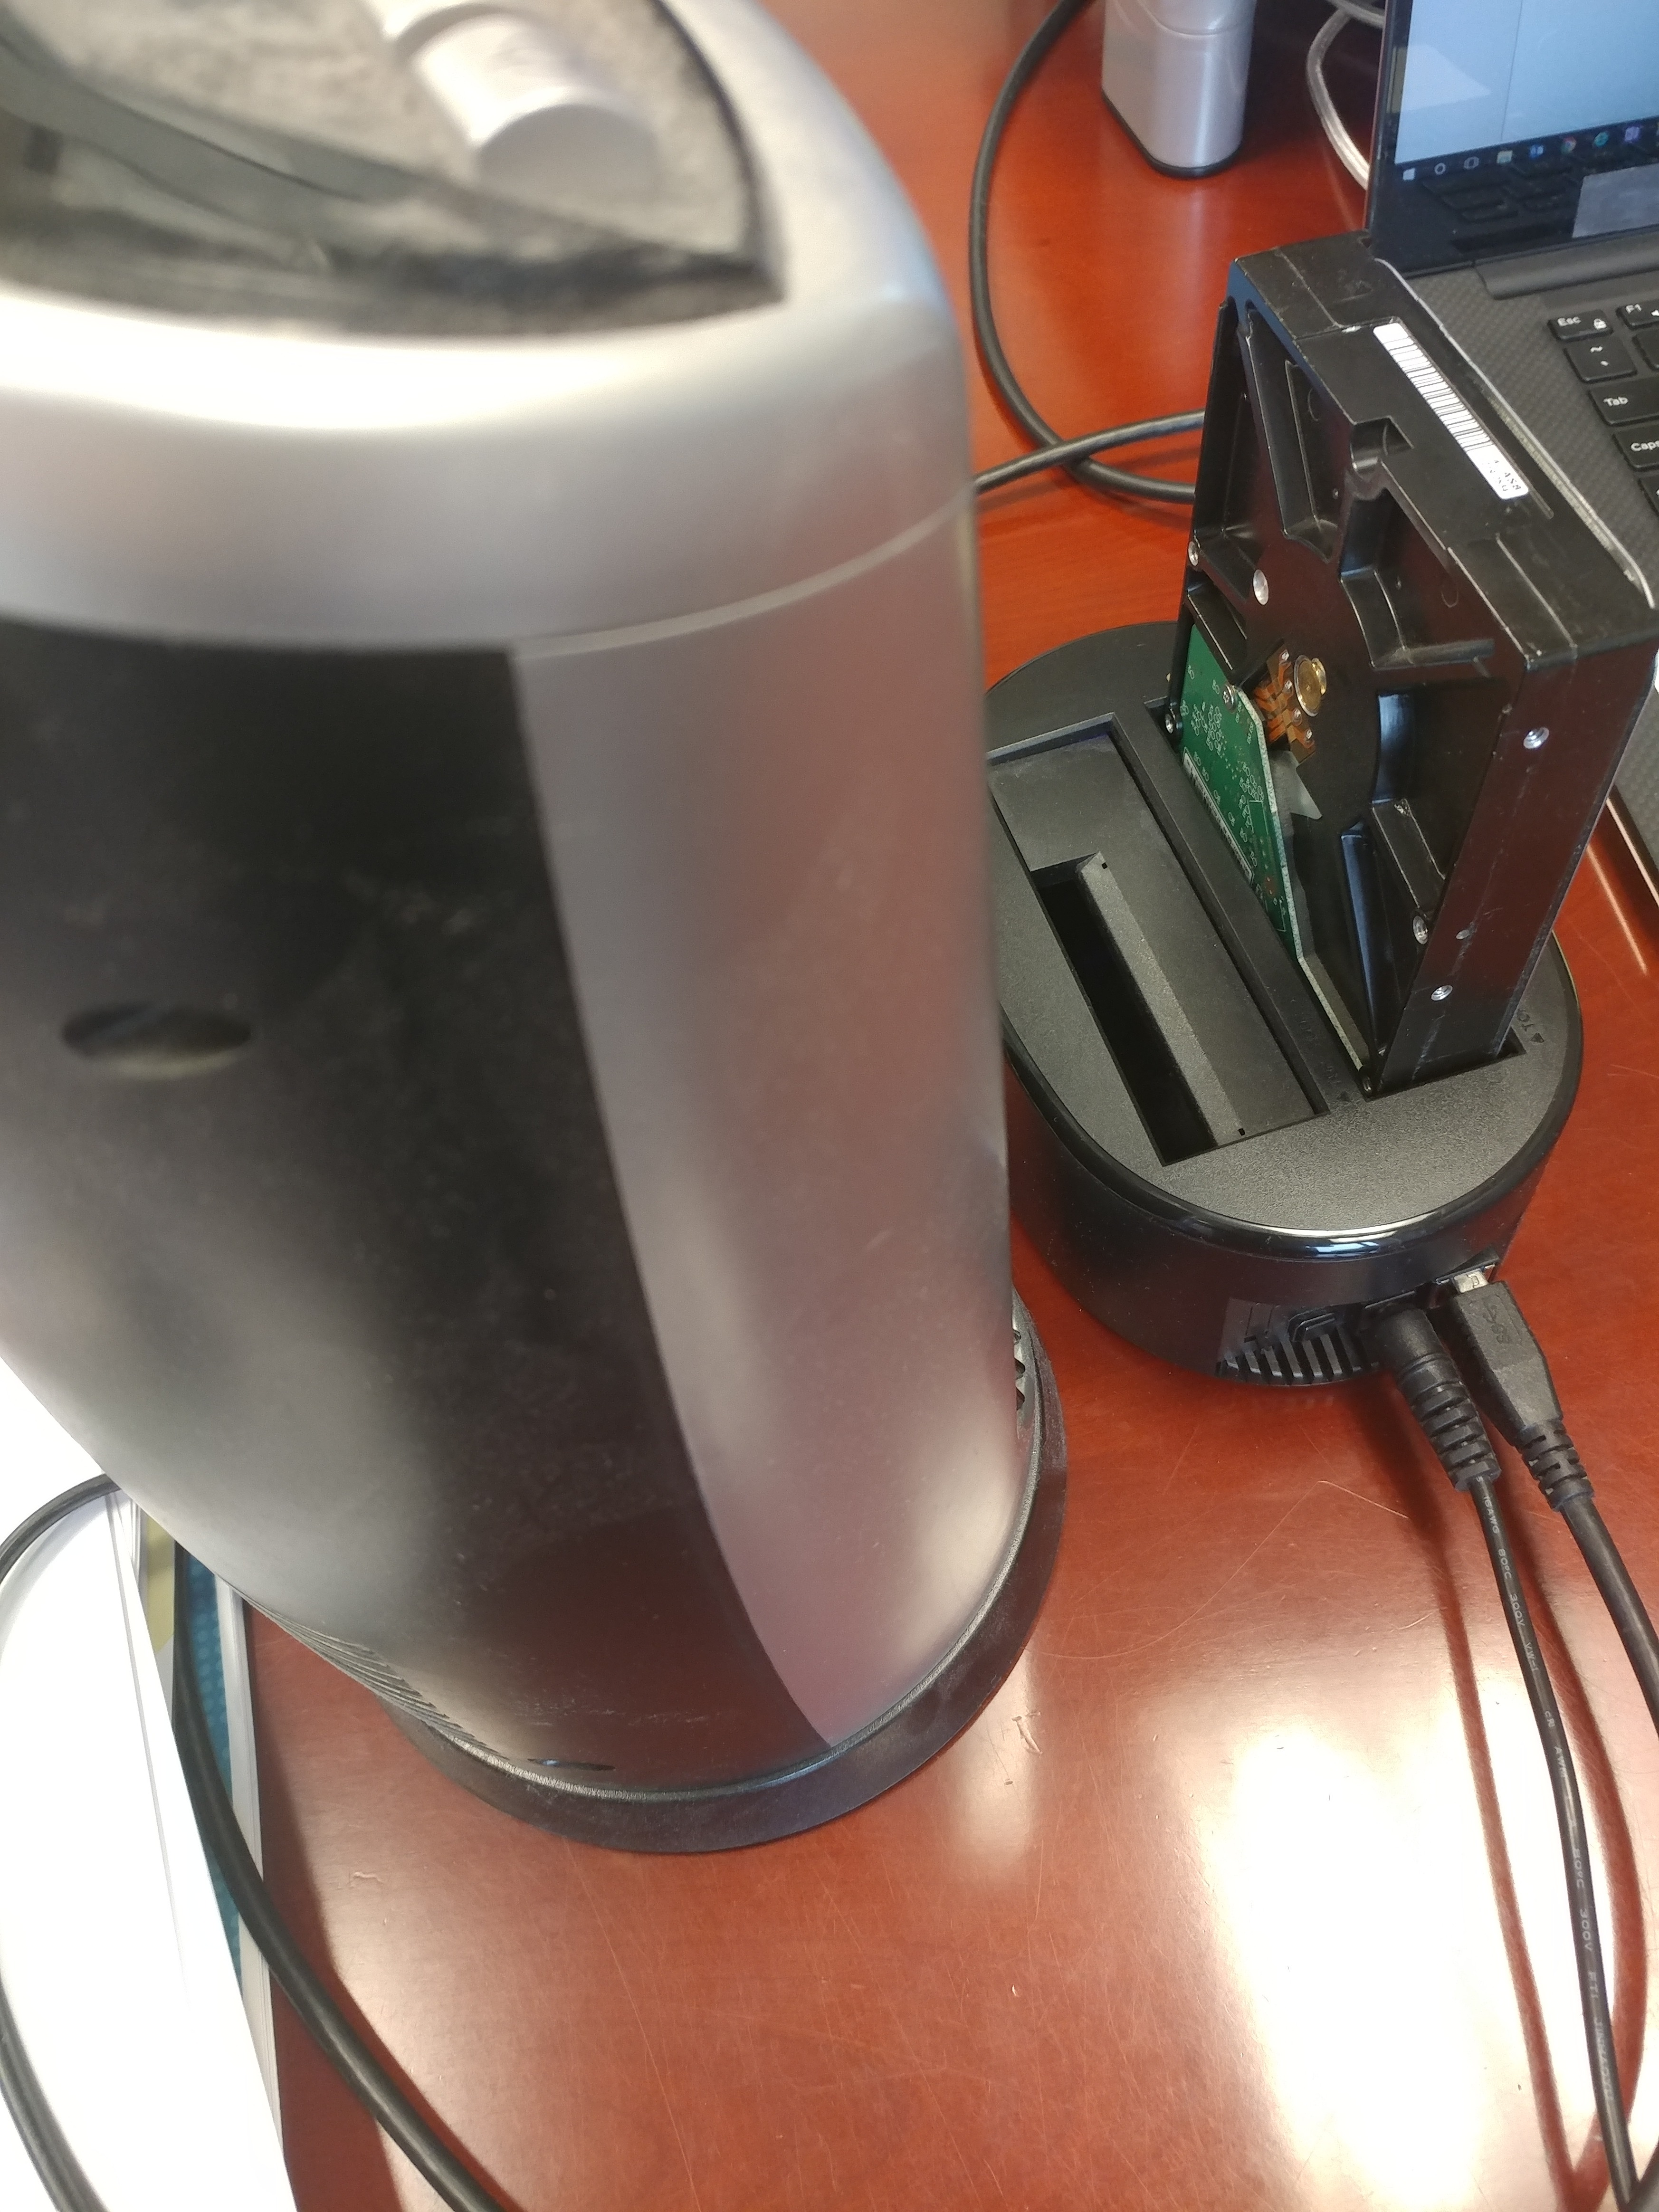 data transfer using hard drive docking station